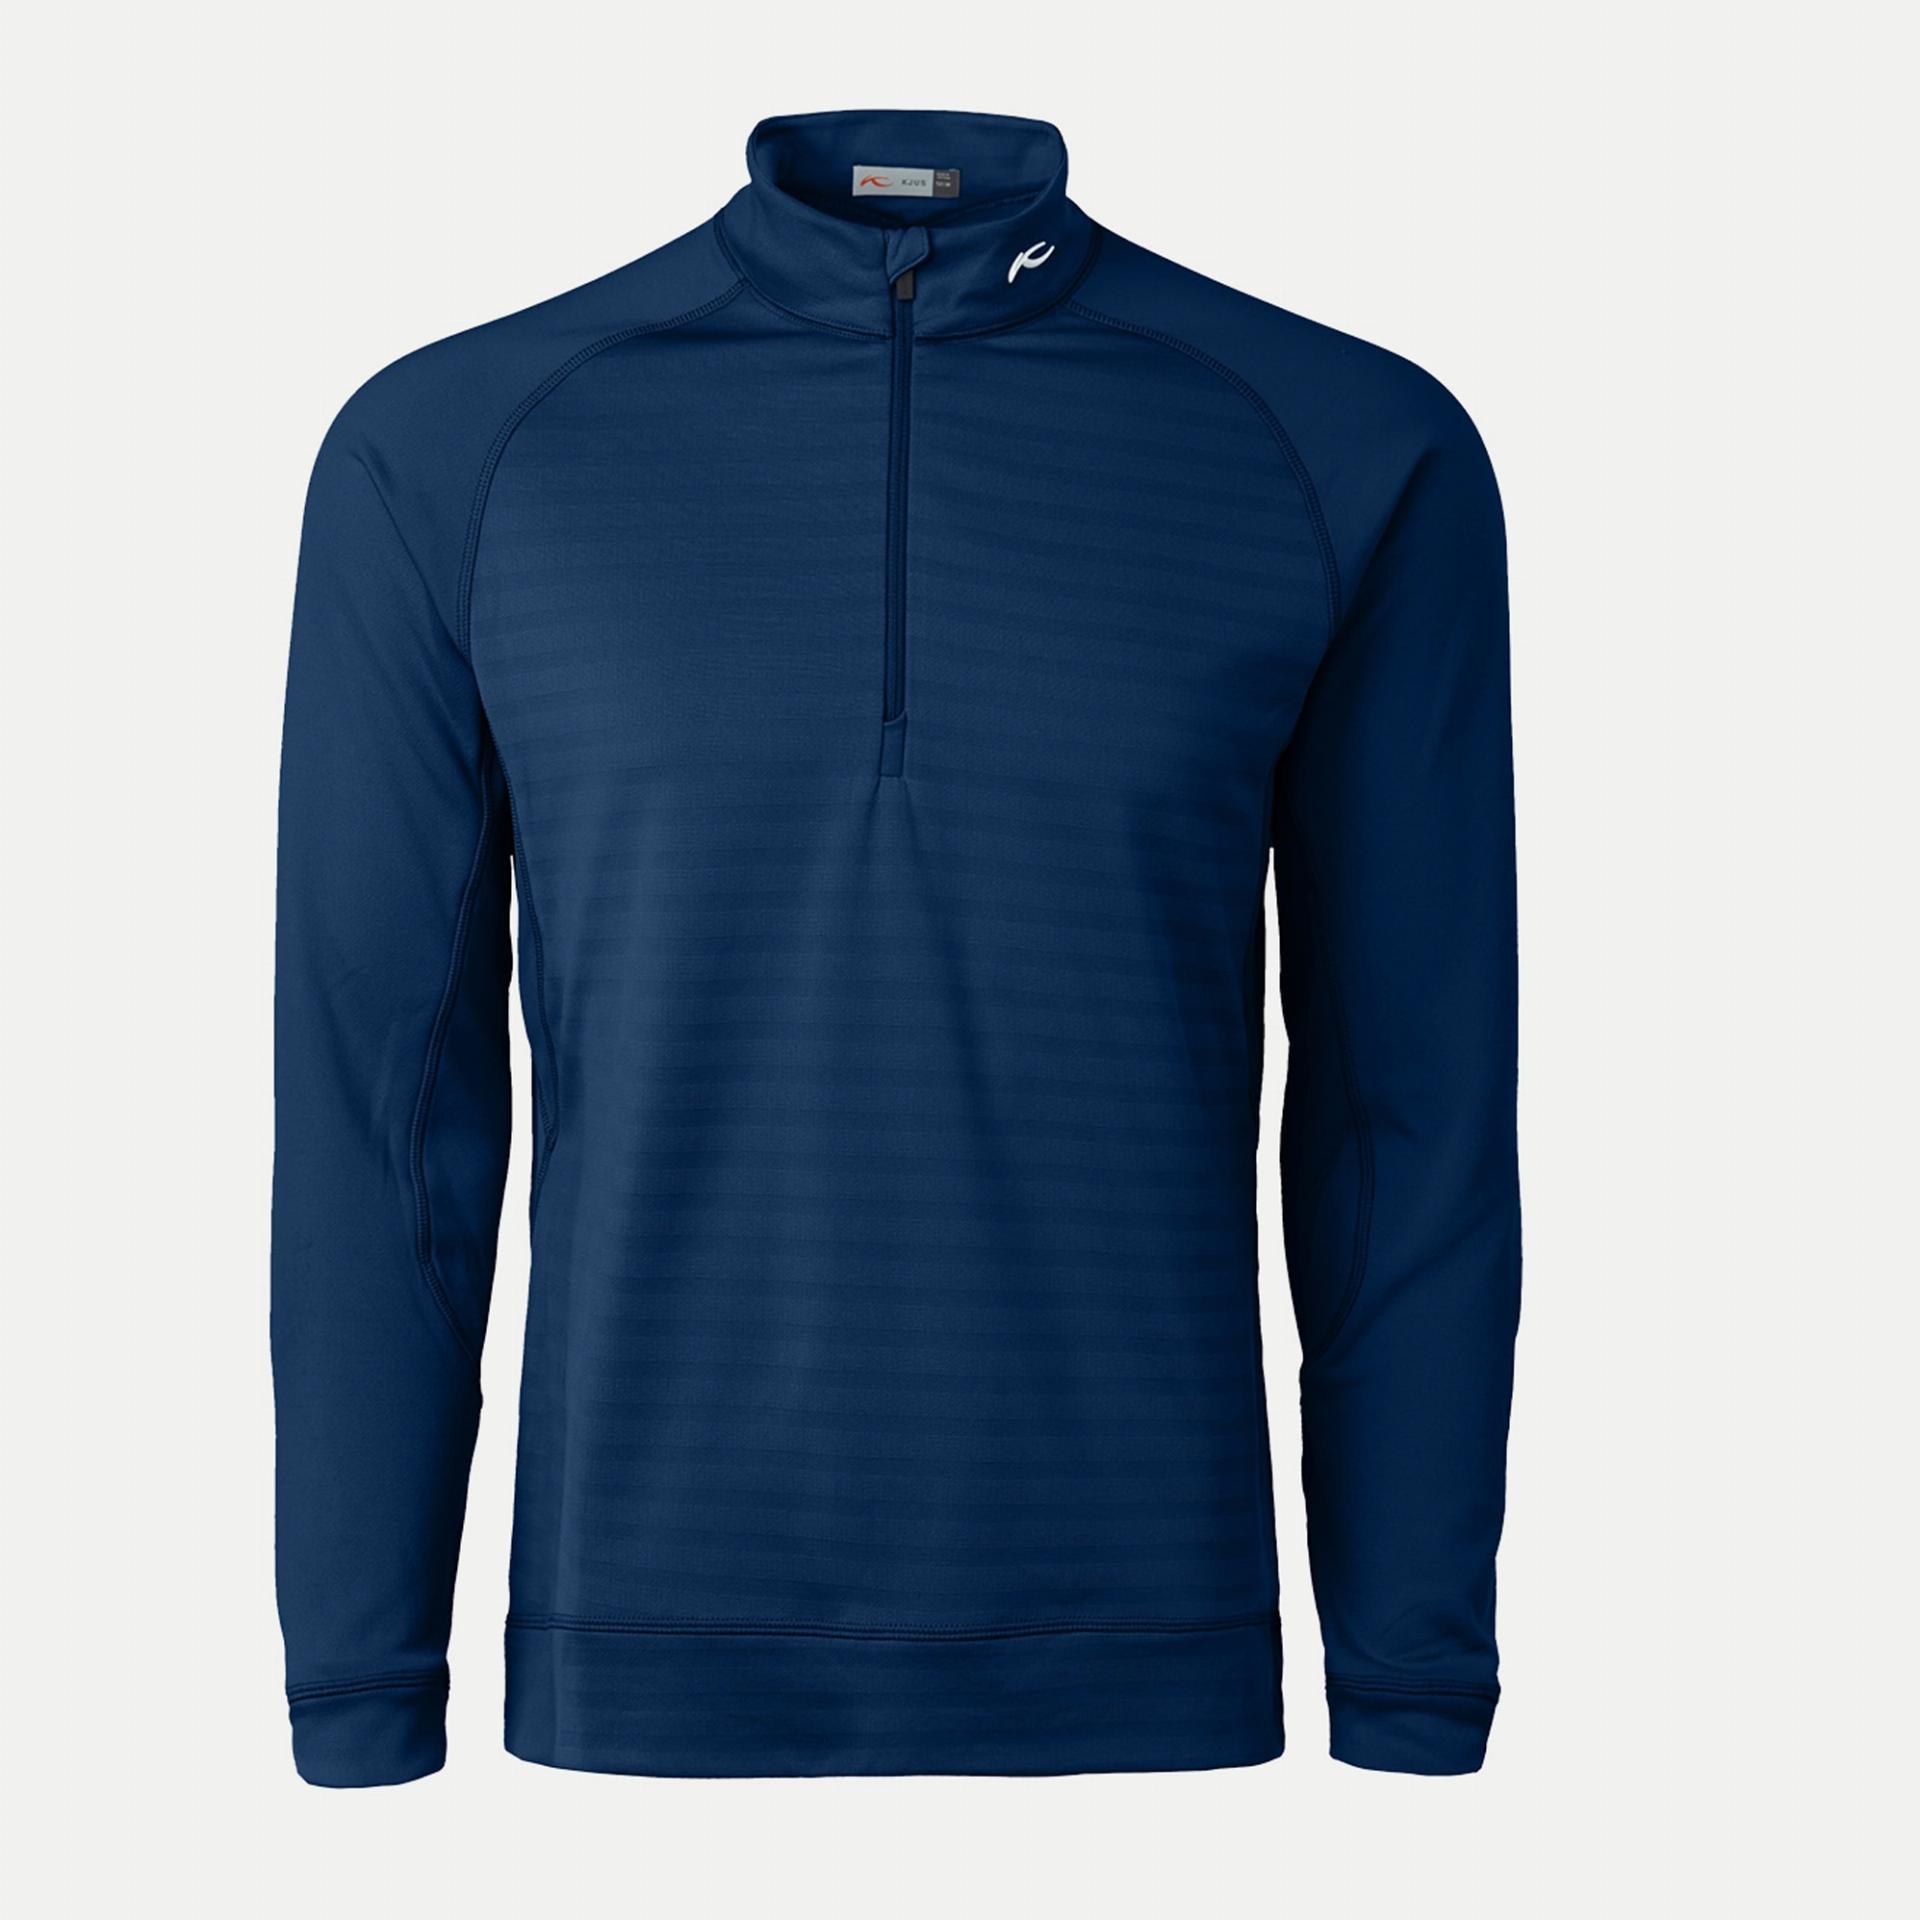 Keano Stripe Half-Zip Midlayer, Atlanta Blue